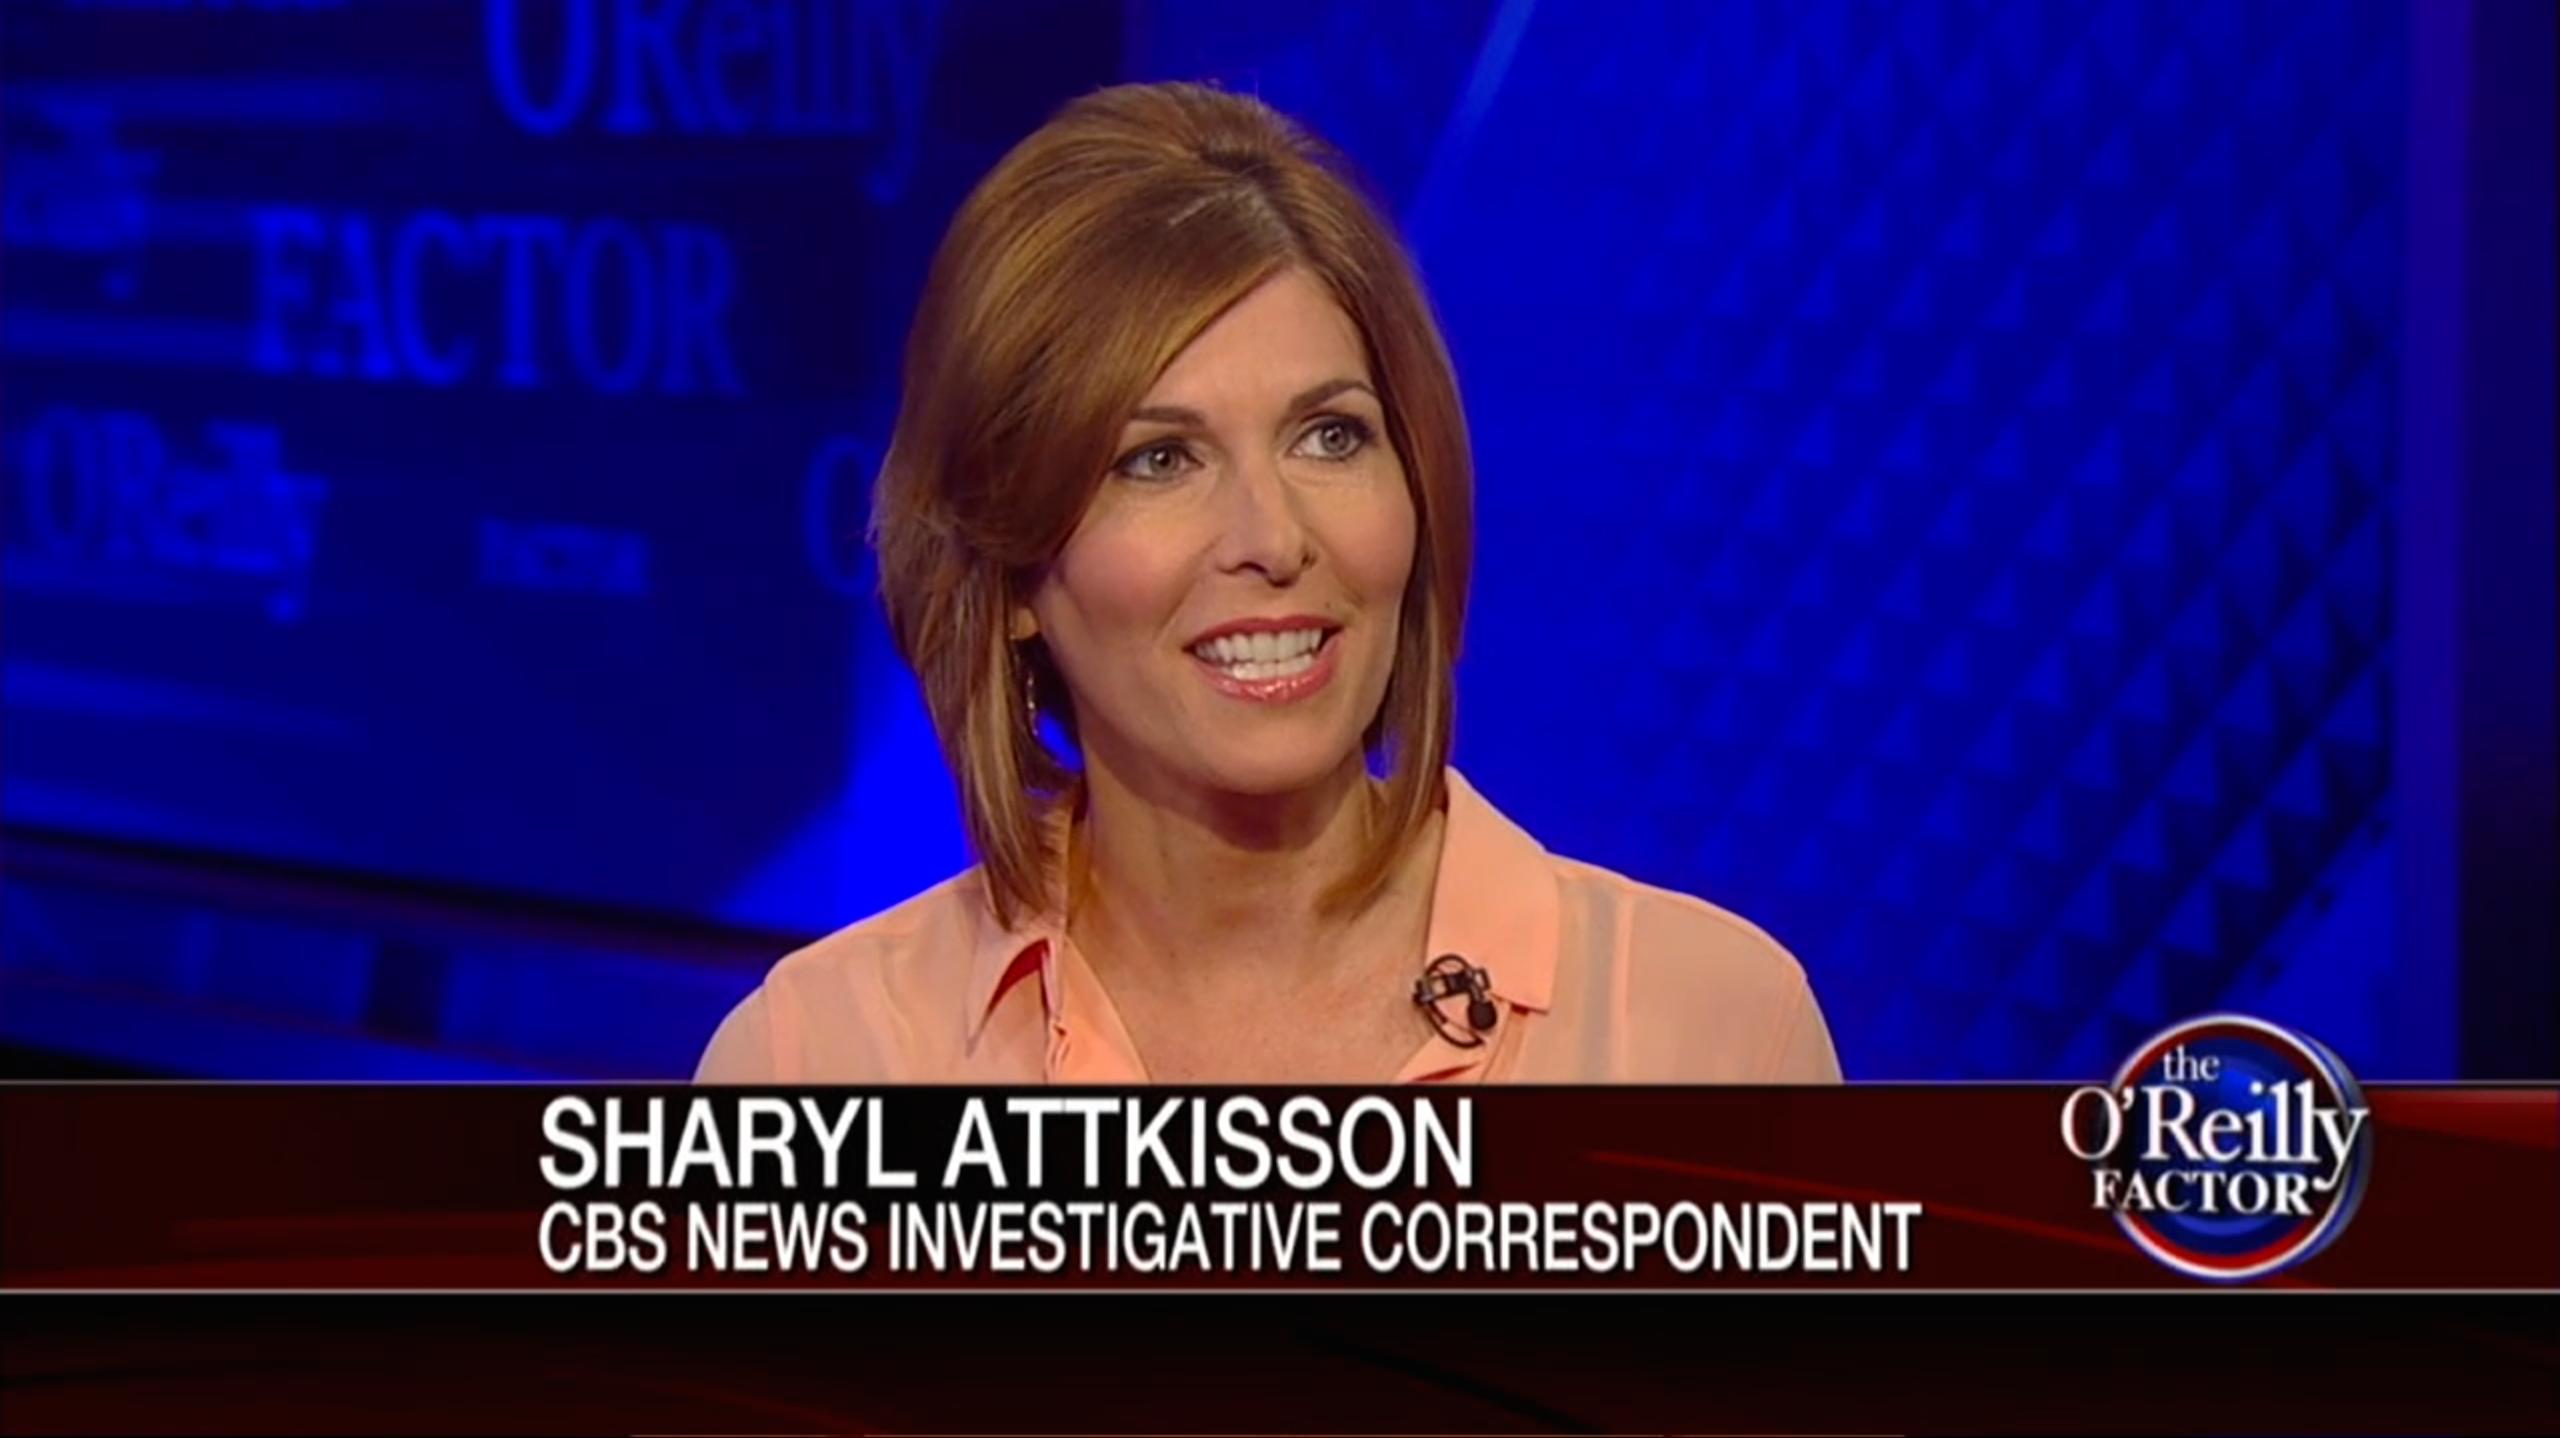 journalism sharyl attkisson resigned